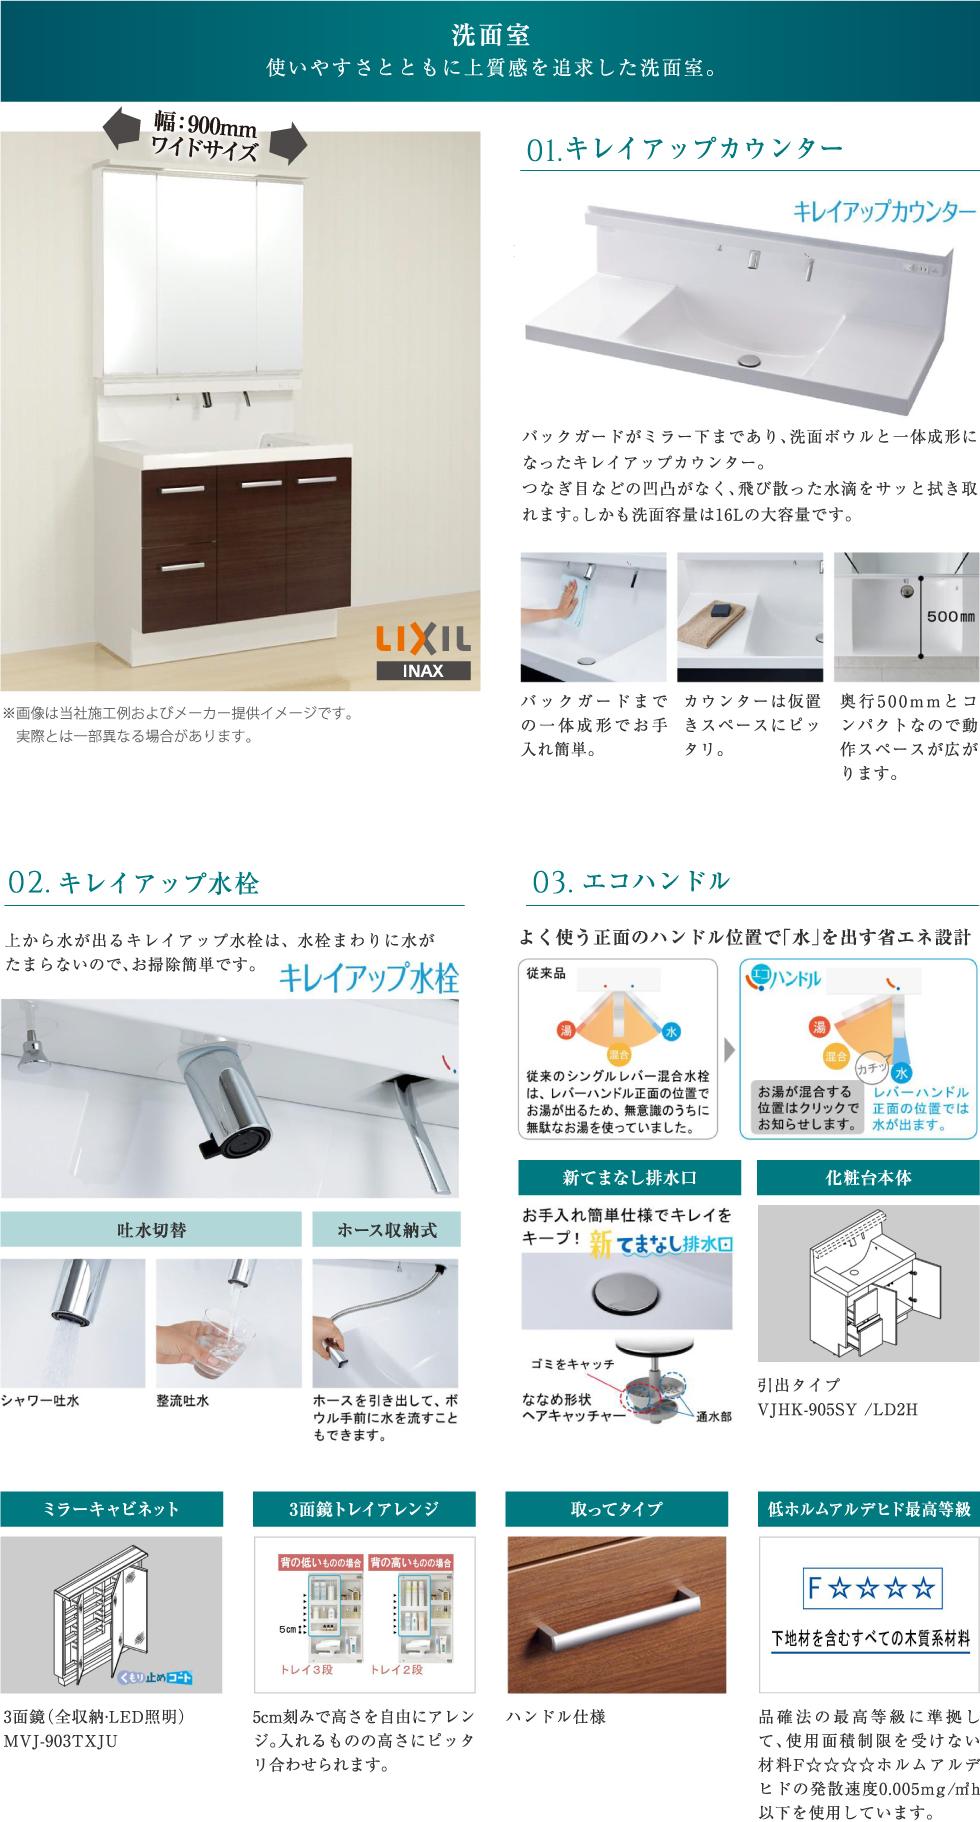 オール電化   LIXILの洗面室